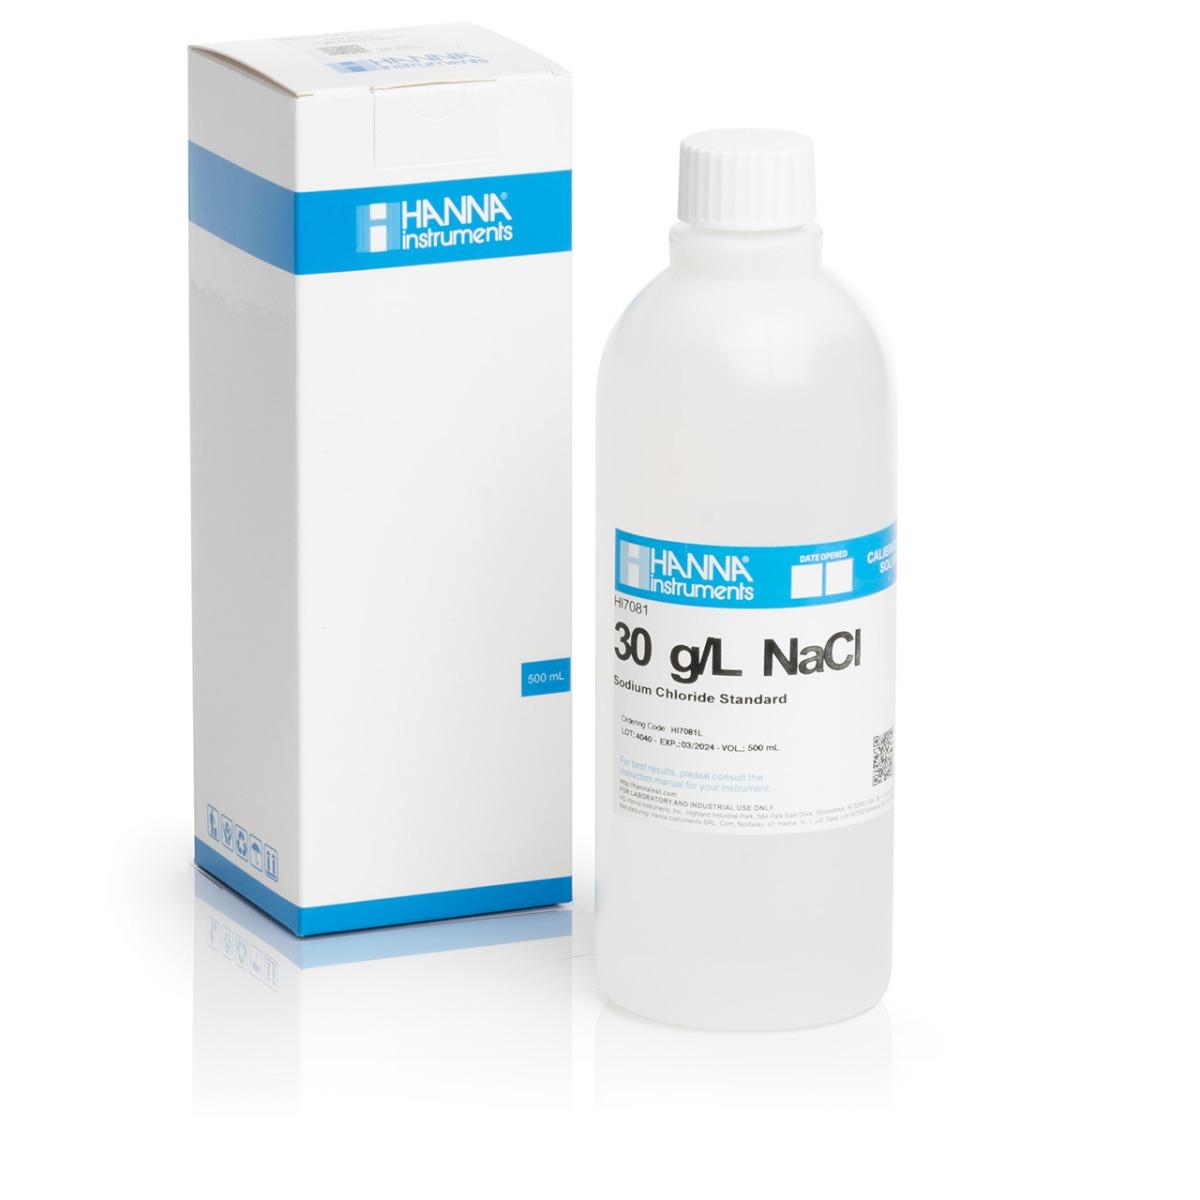 Solución Estándar de Cloruro de Sodio 30 g/L (500 ml) - HI7081L